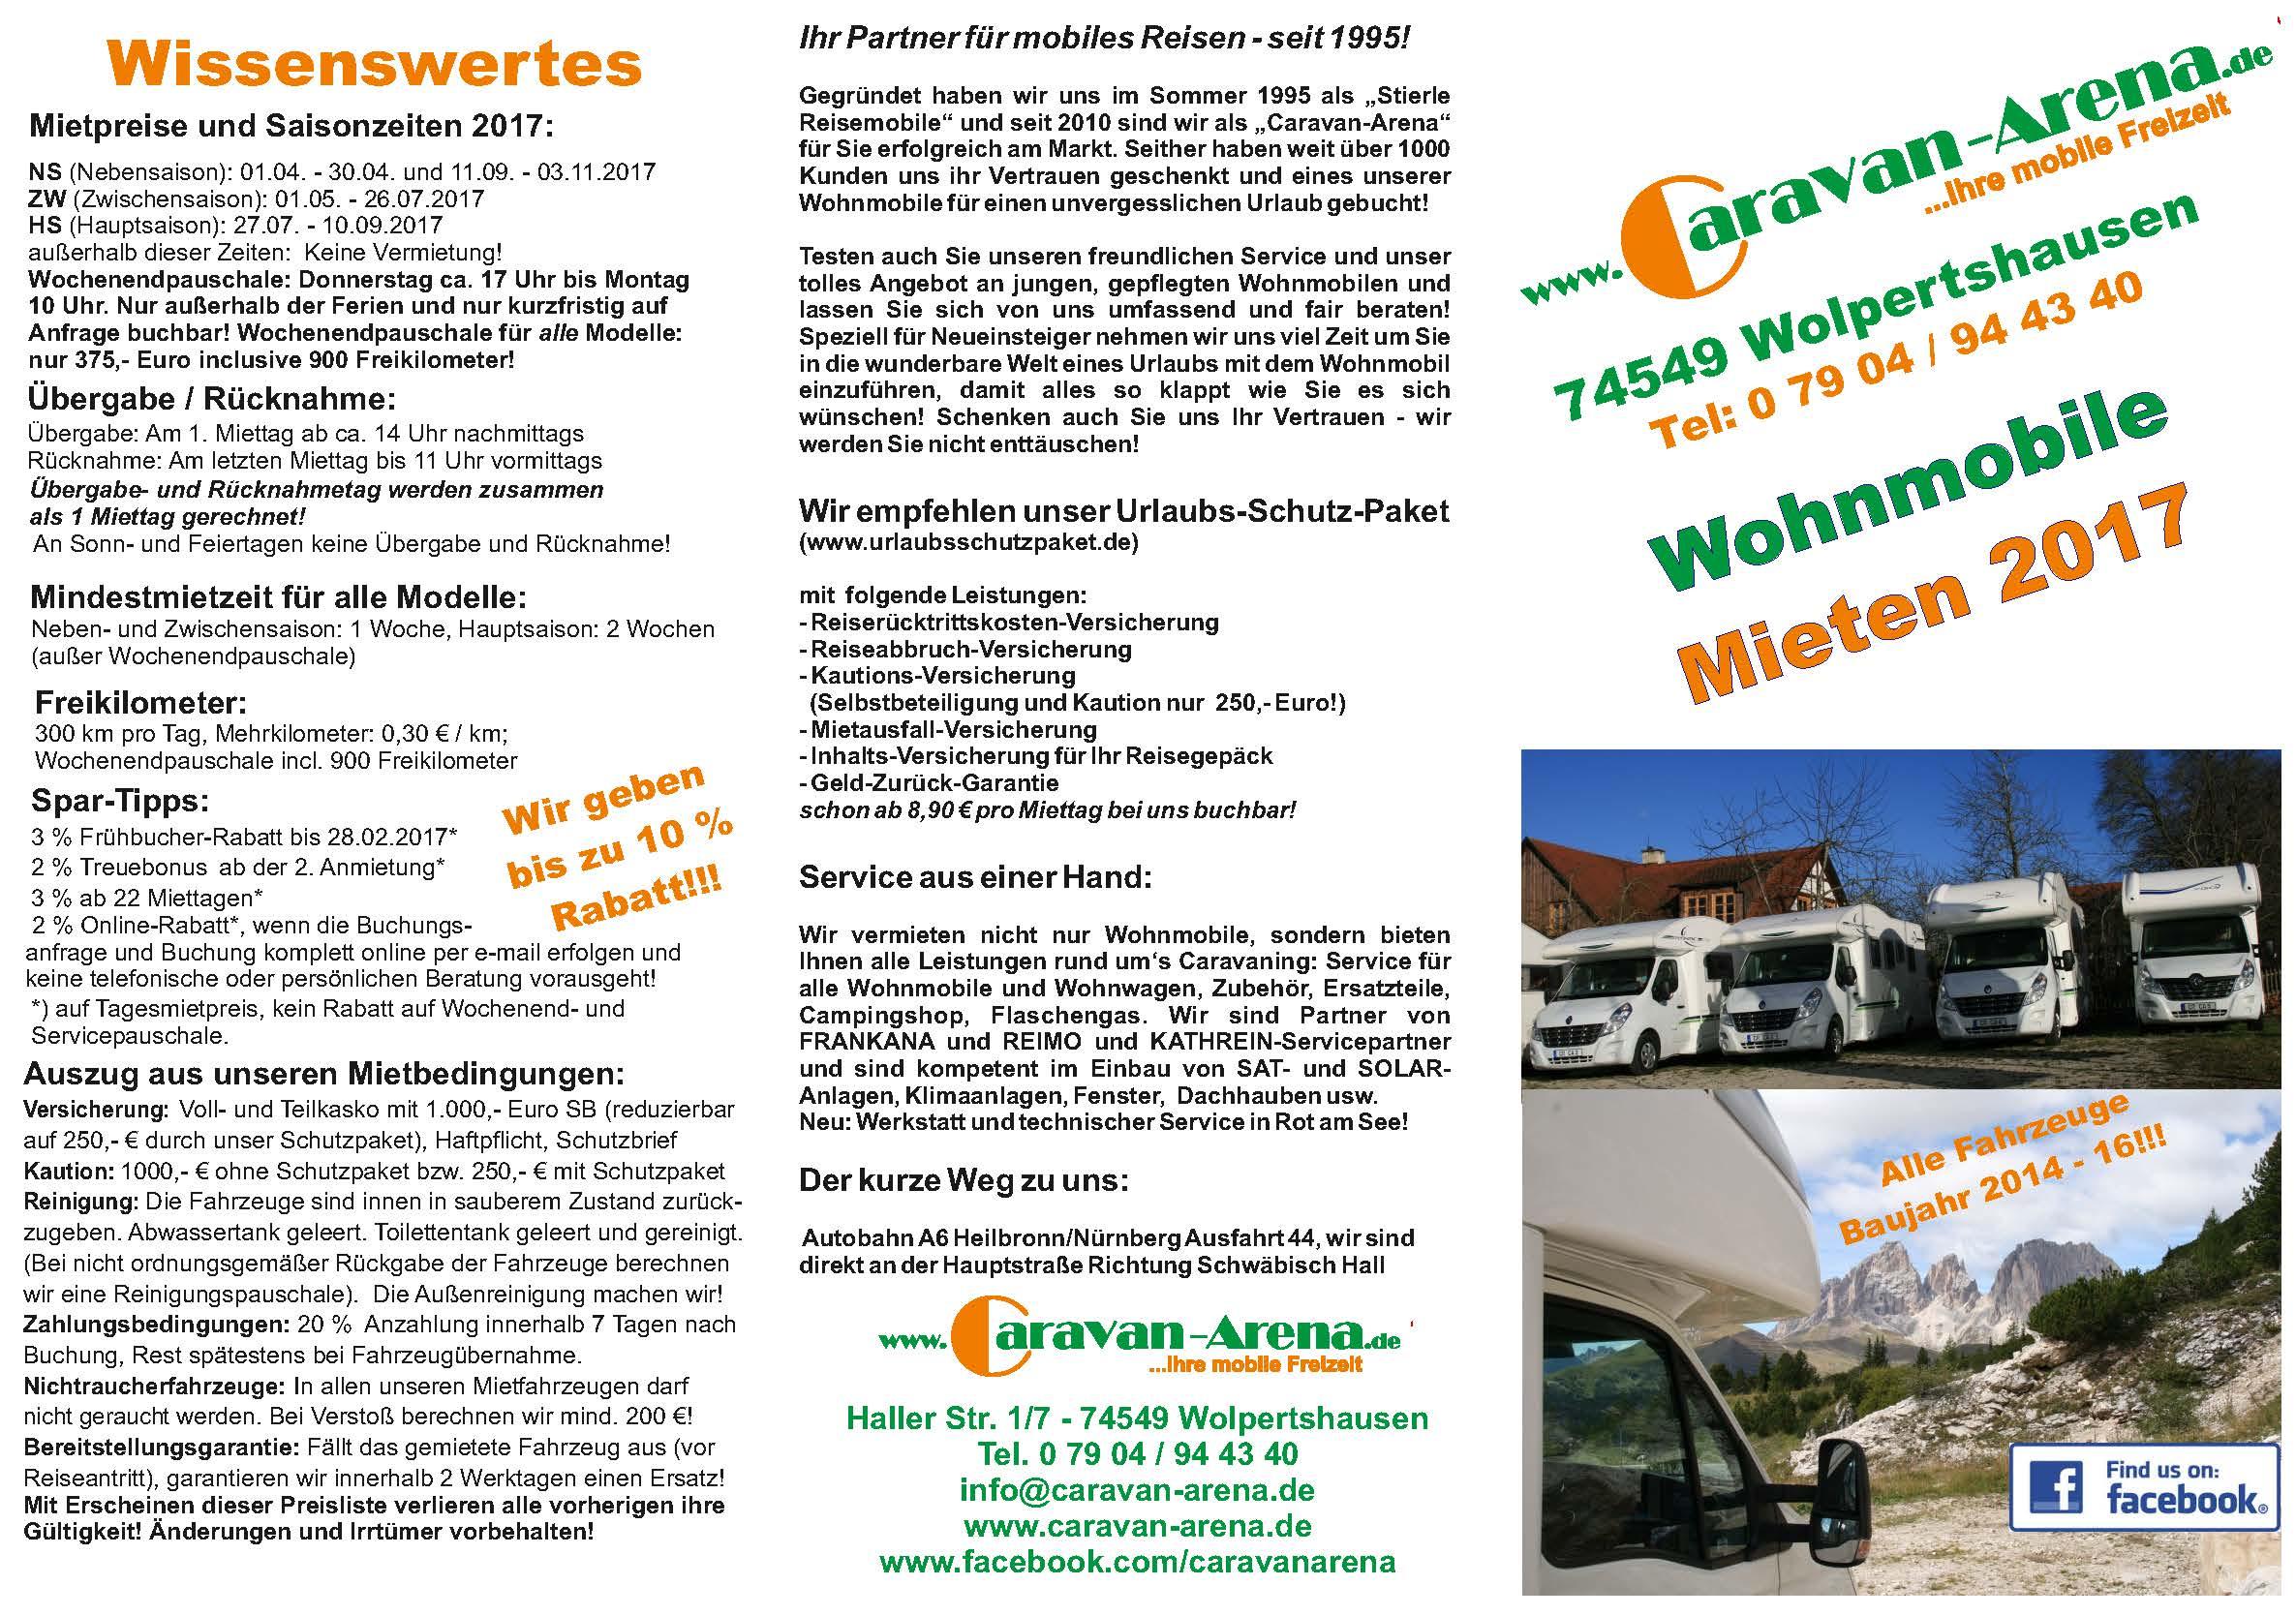 Caravan-Arena Mietflyer 2017